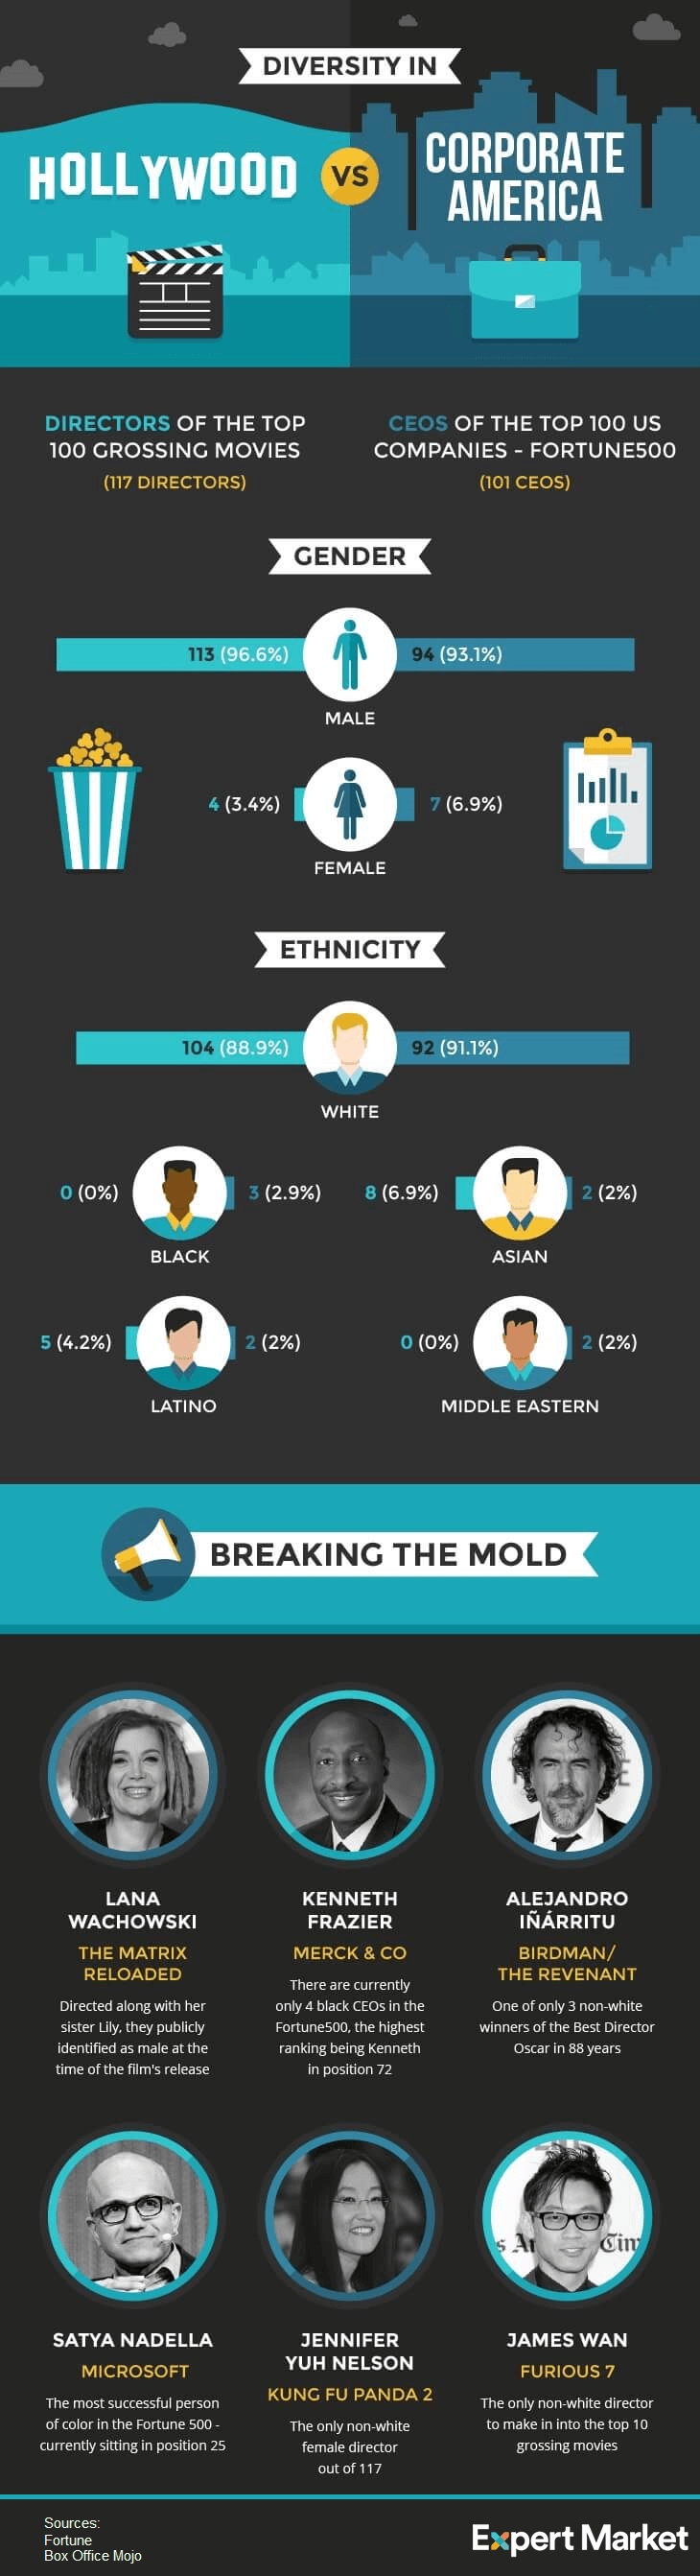 expert-watch-diversity-infographic